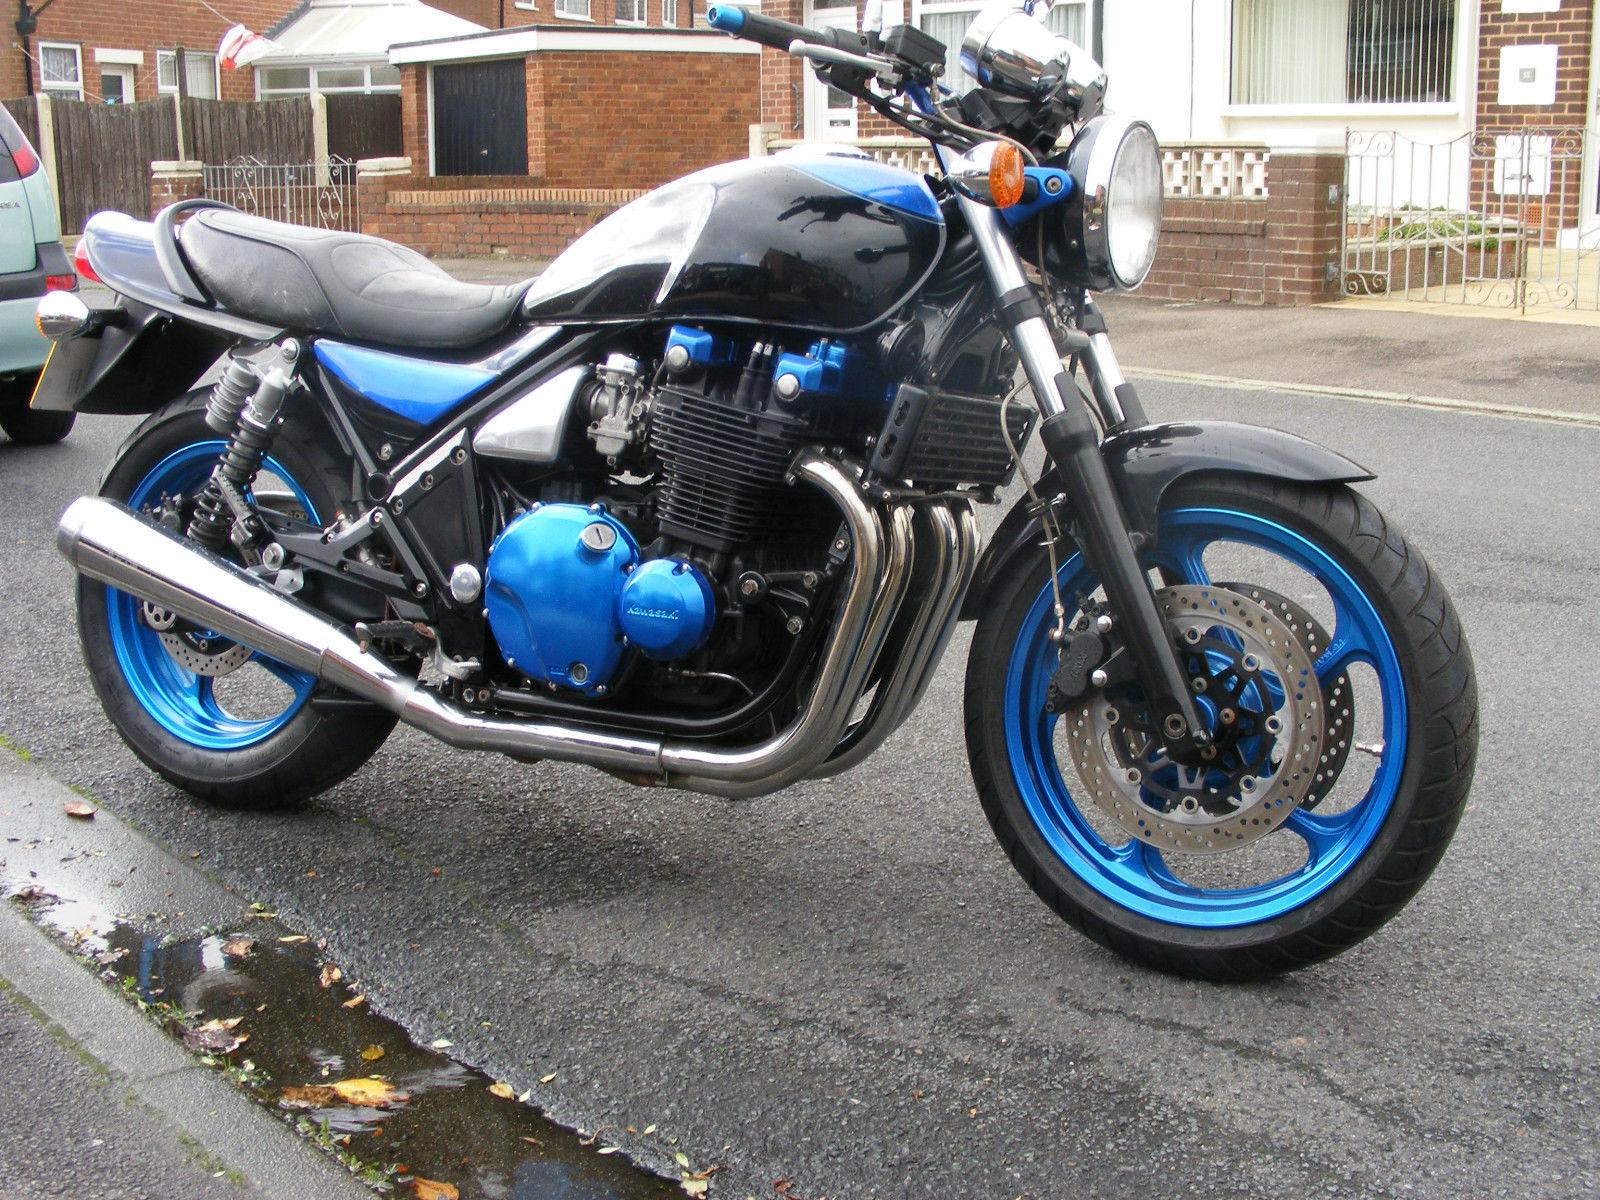 1993 Kawasaki Zephyr 1100 big aircooled muscle bike in top